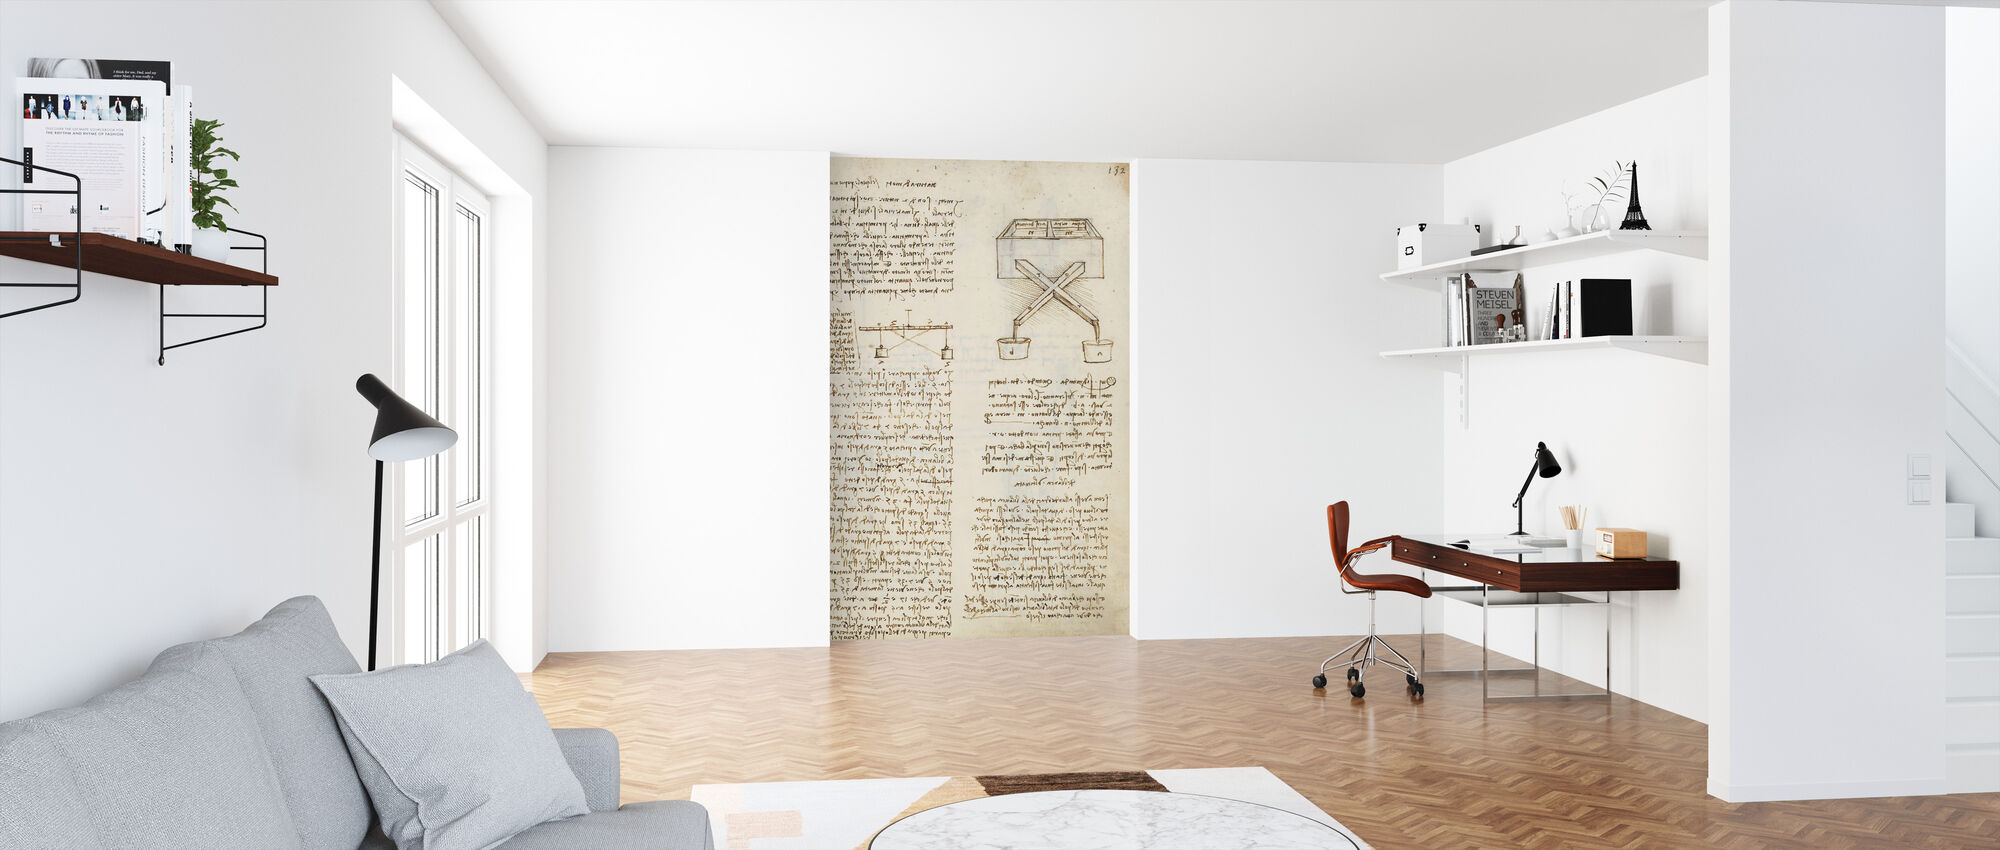 Codex Madrid III - Leonardo da Vinci - Wallpaper - Office